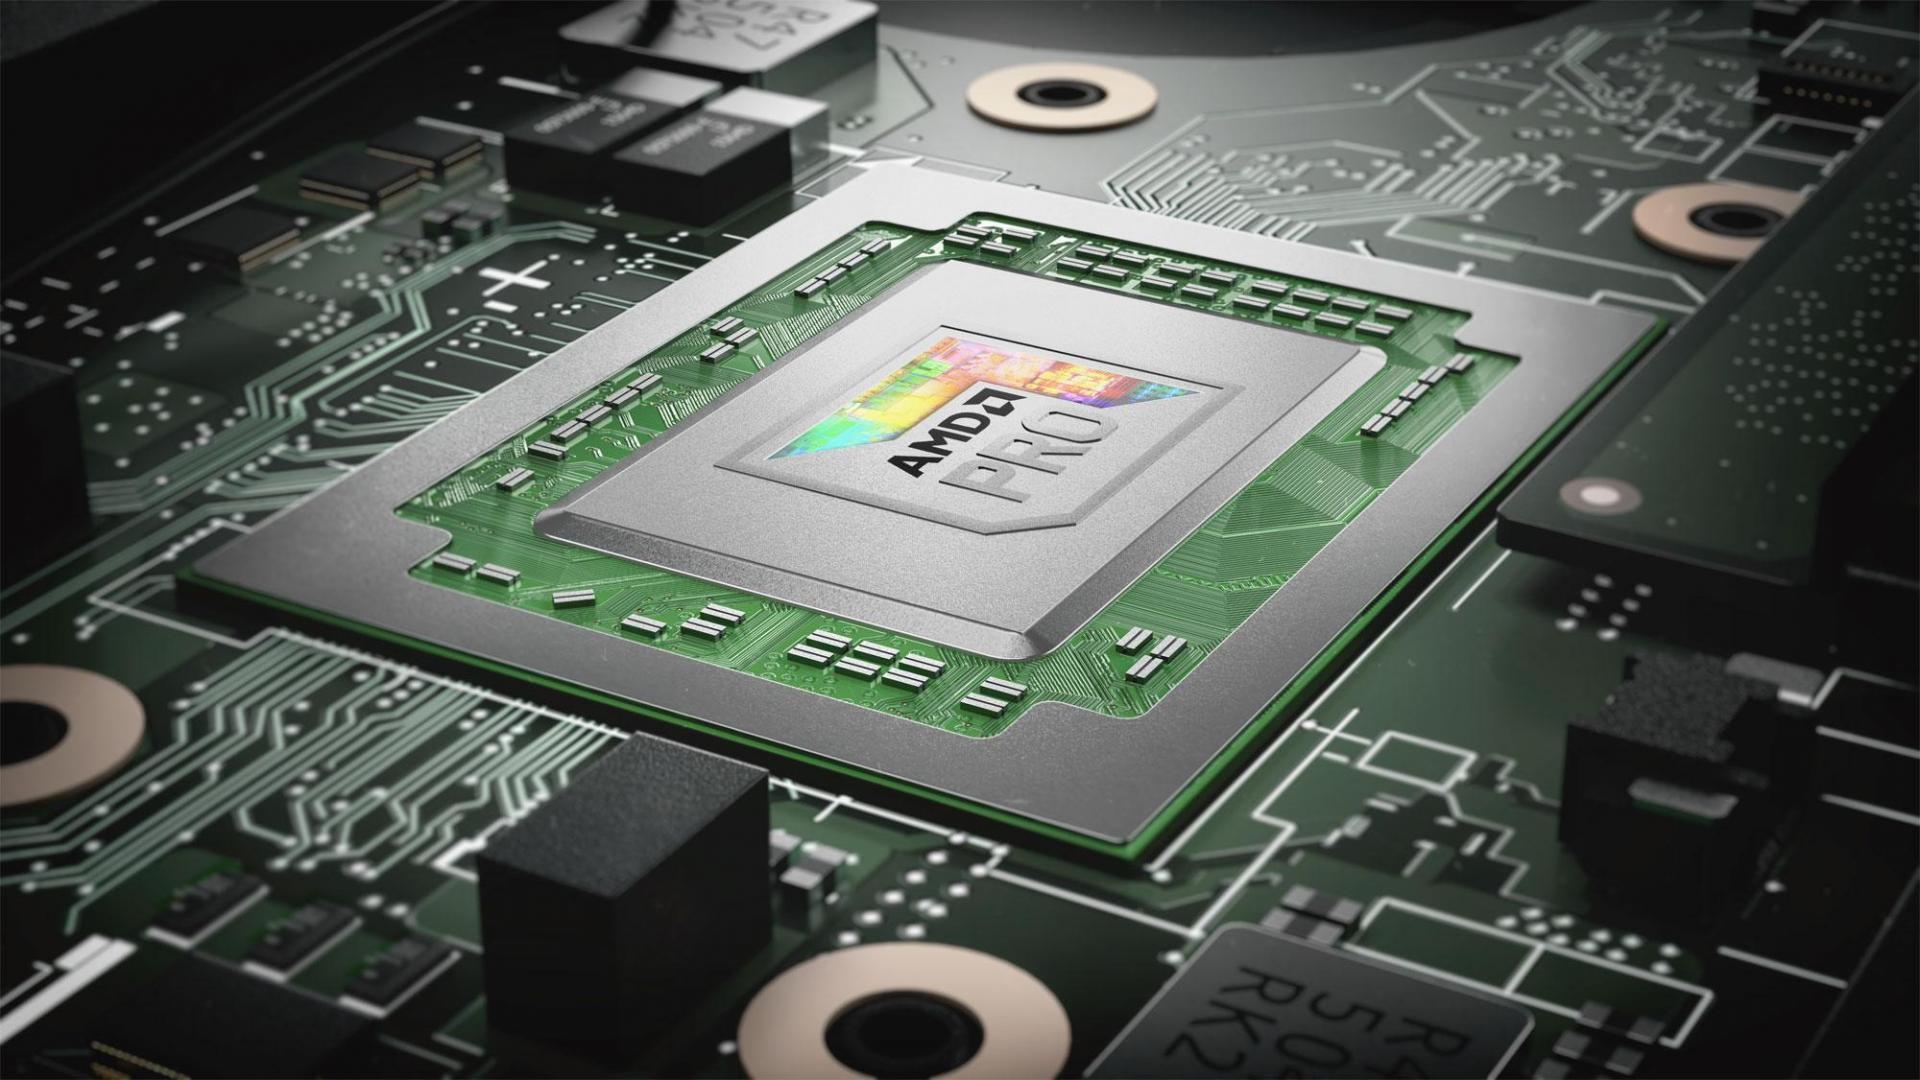 Lenovo представляет: ThinkPad A275, ThinkPad A475, Thinkcentre M715 SFF, Thinkcentre M715 Tower